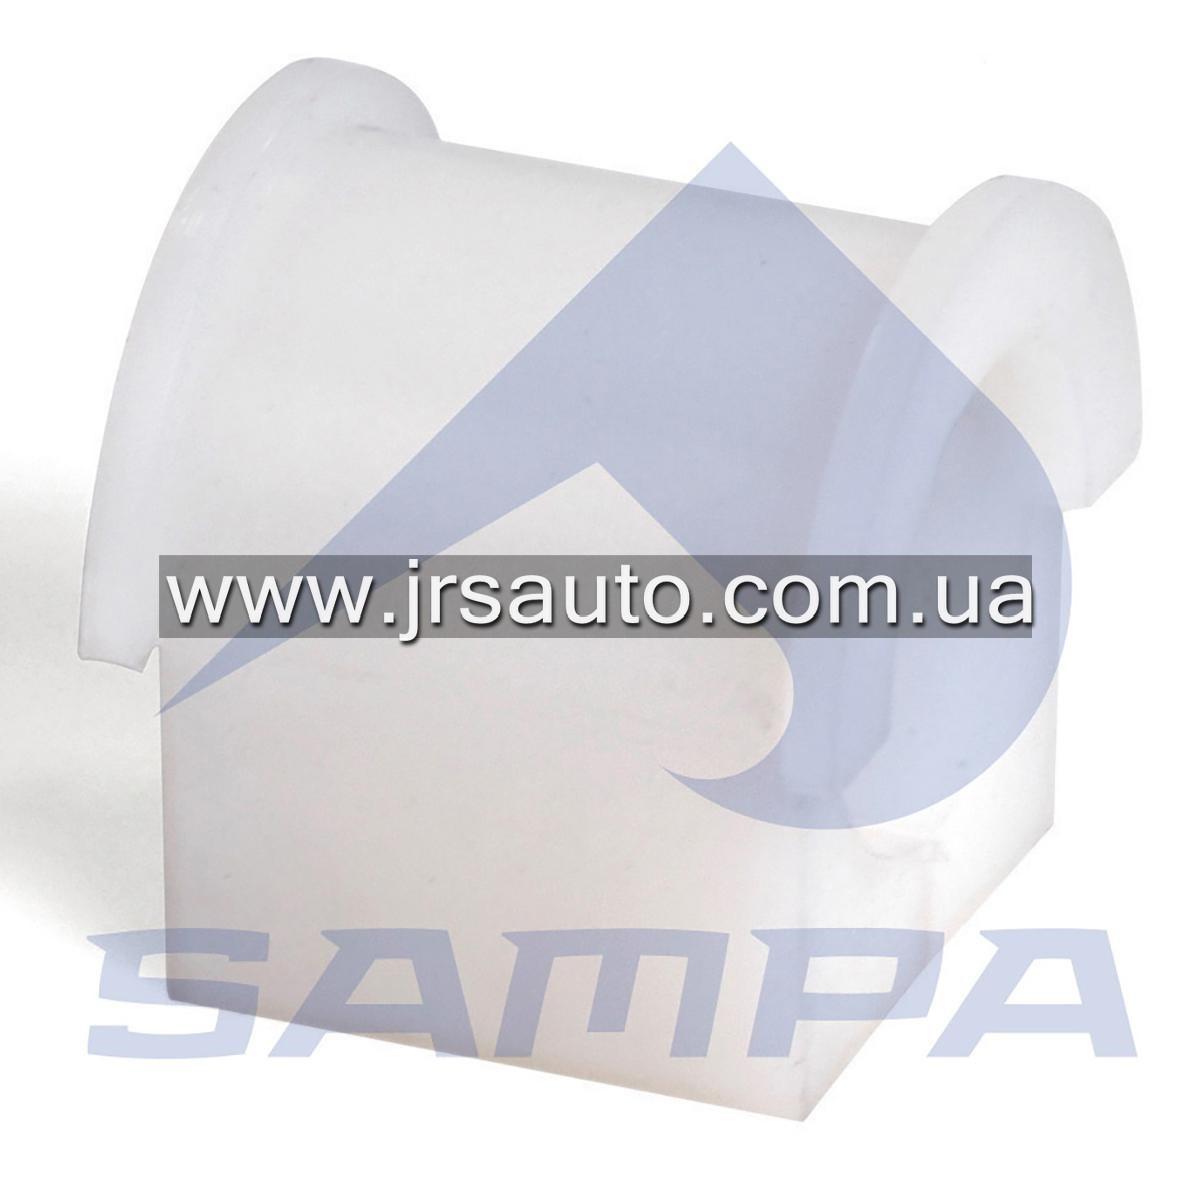 Втулка стабилизатора IVECO (d43x68) \98415468 \ 060.003